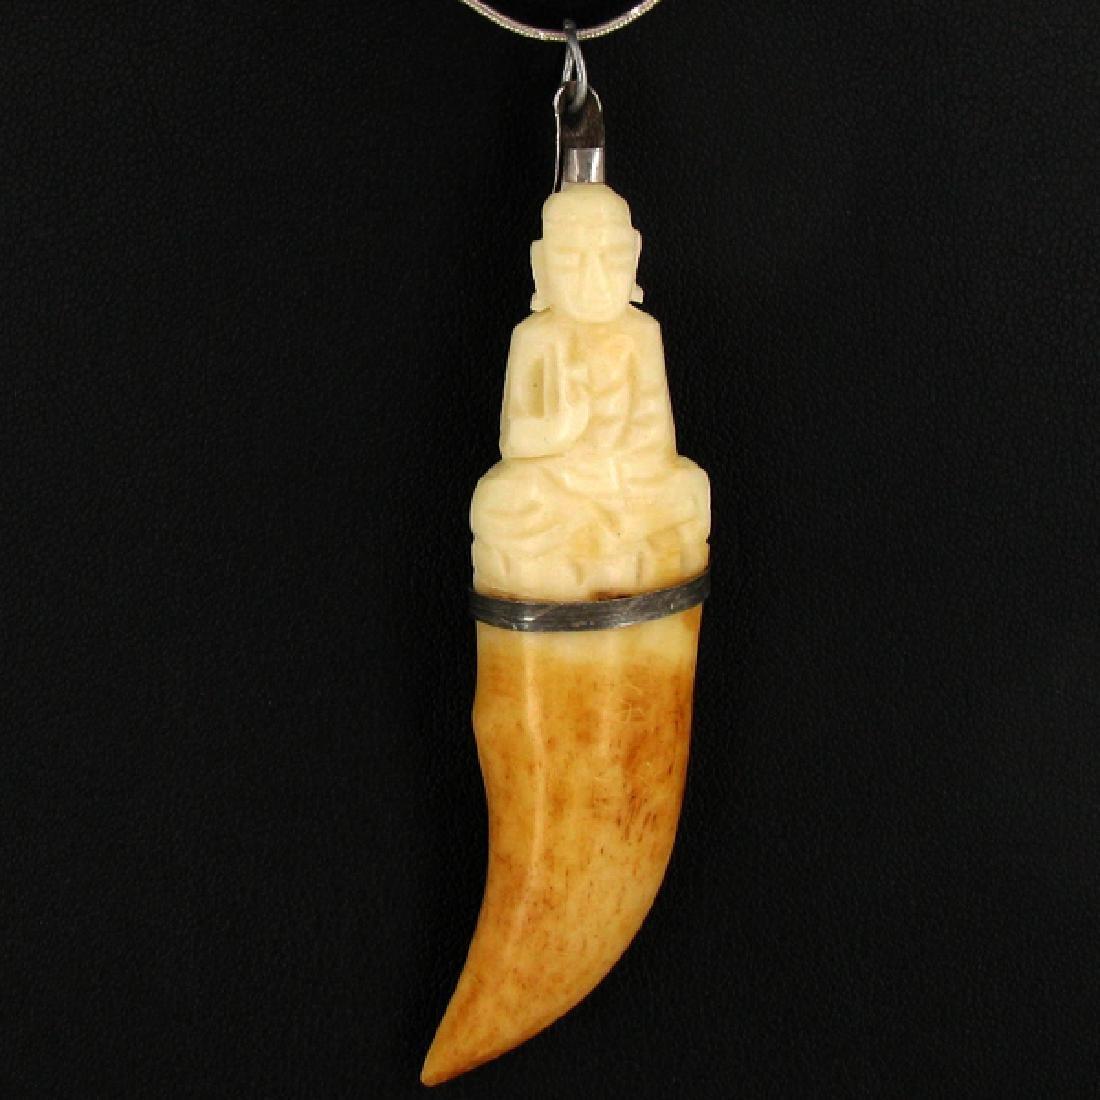 58.62ct Carved Bone Buddha Pendant